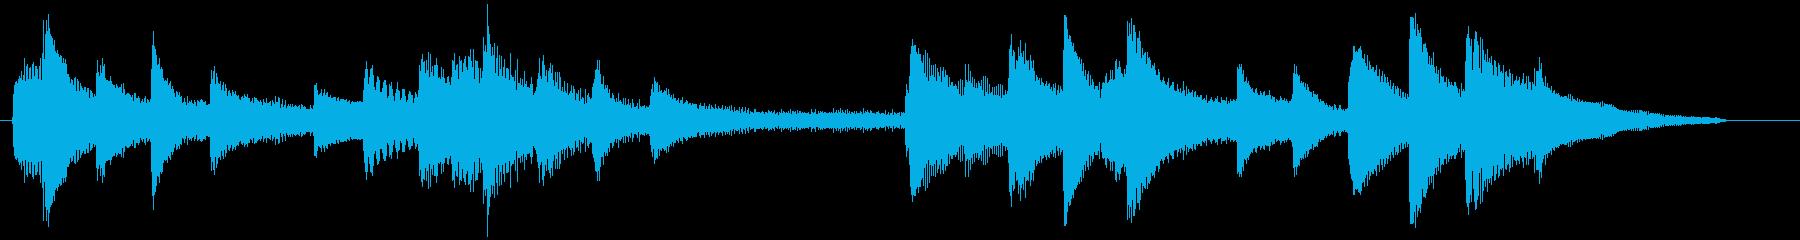 Shinning Moment 1の再生済みの波形